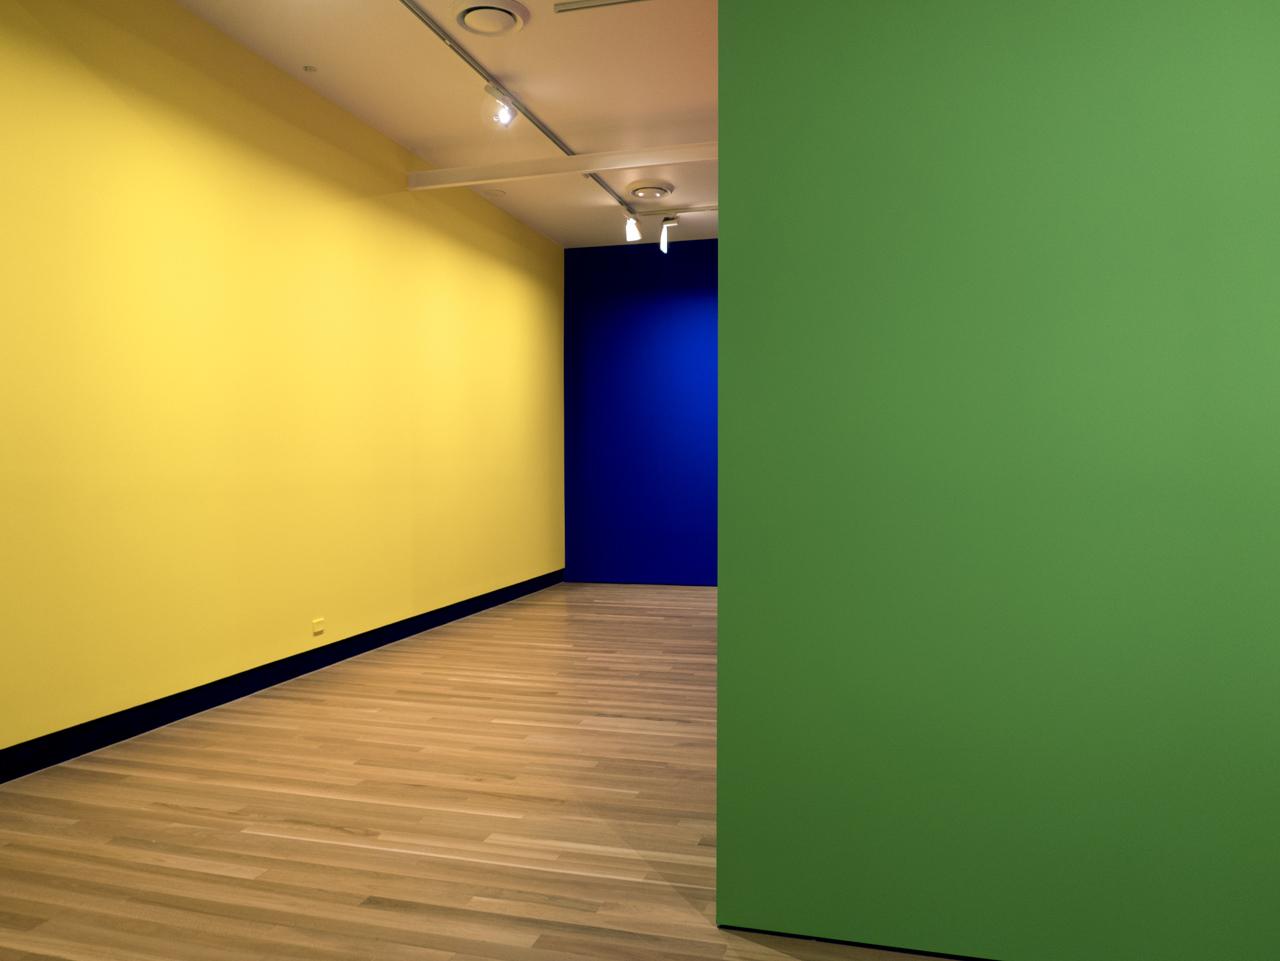 Robert Owen Afterglow Latrobe Reginal Gallery Install 26_LR.jpg